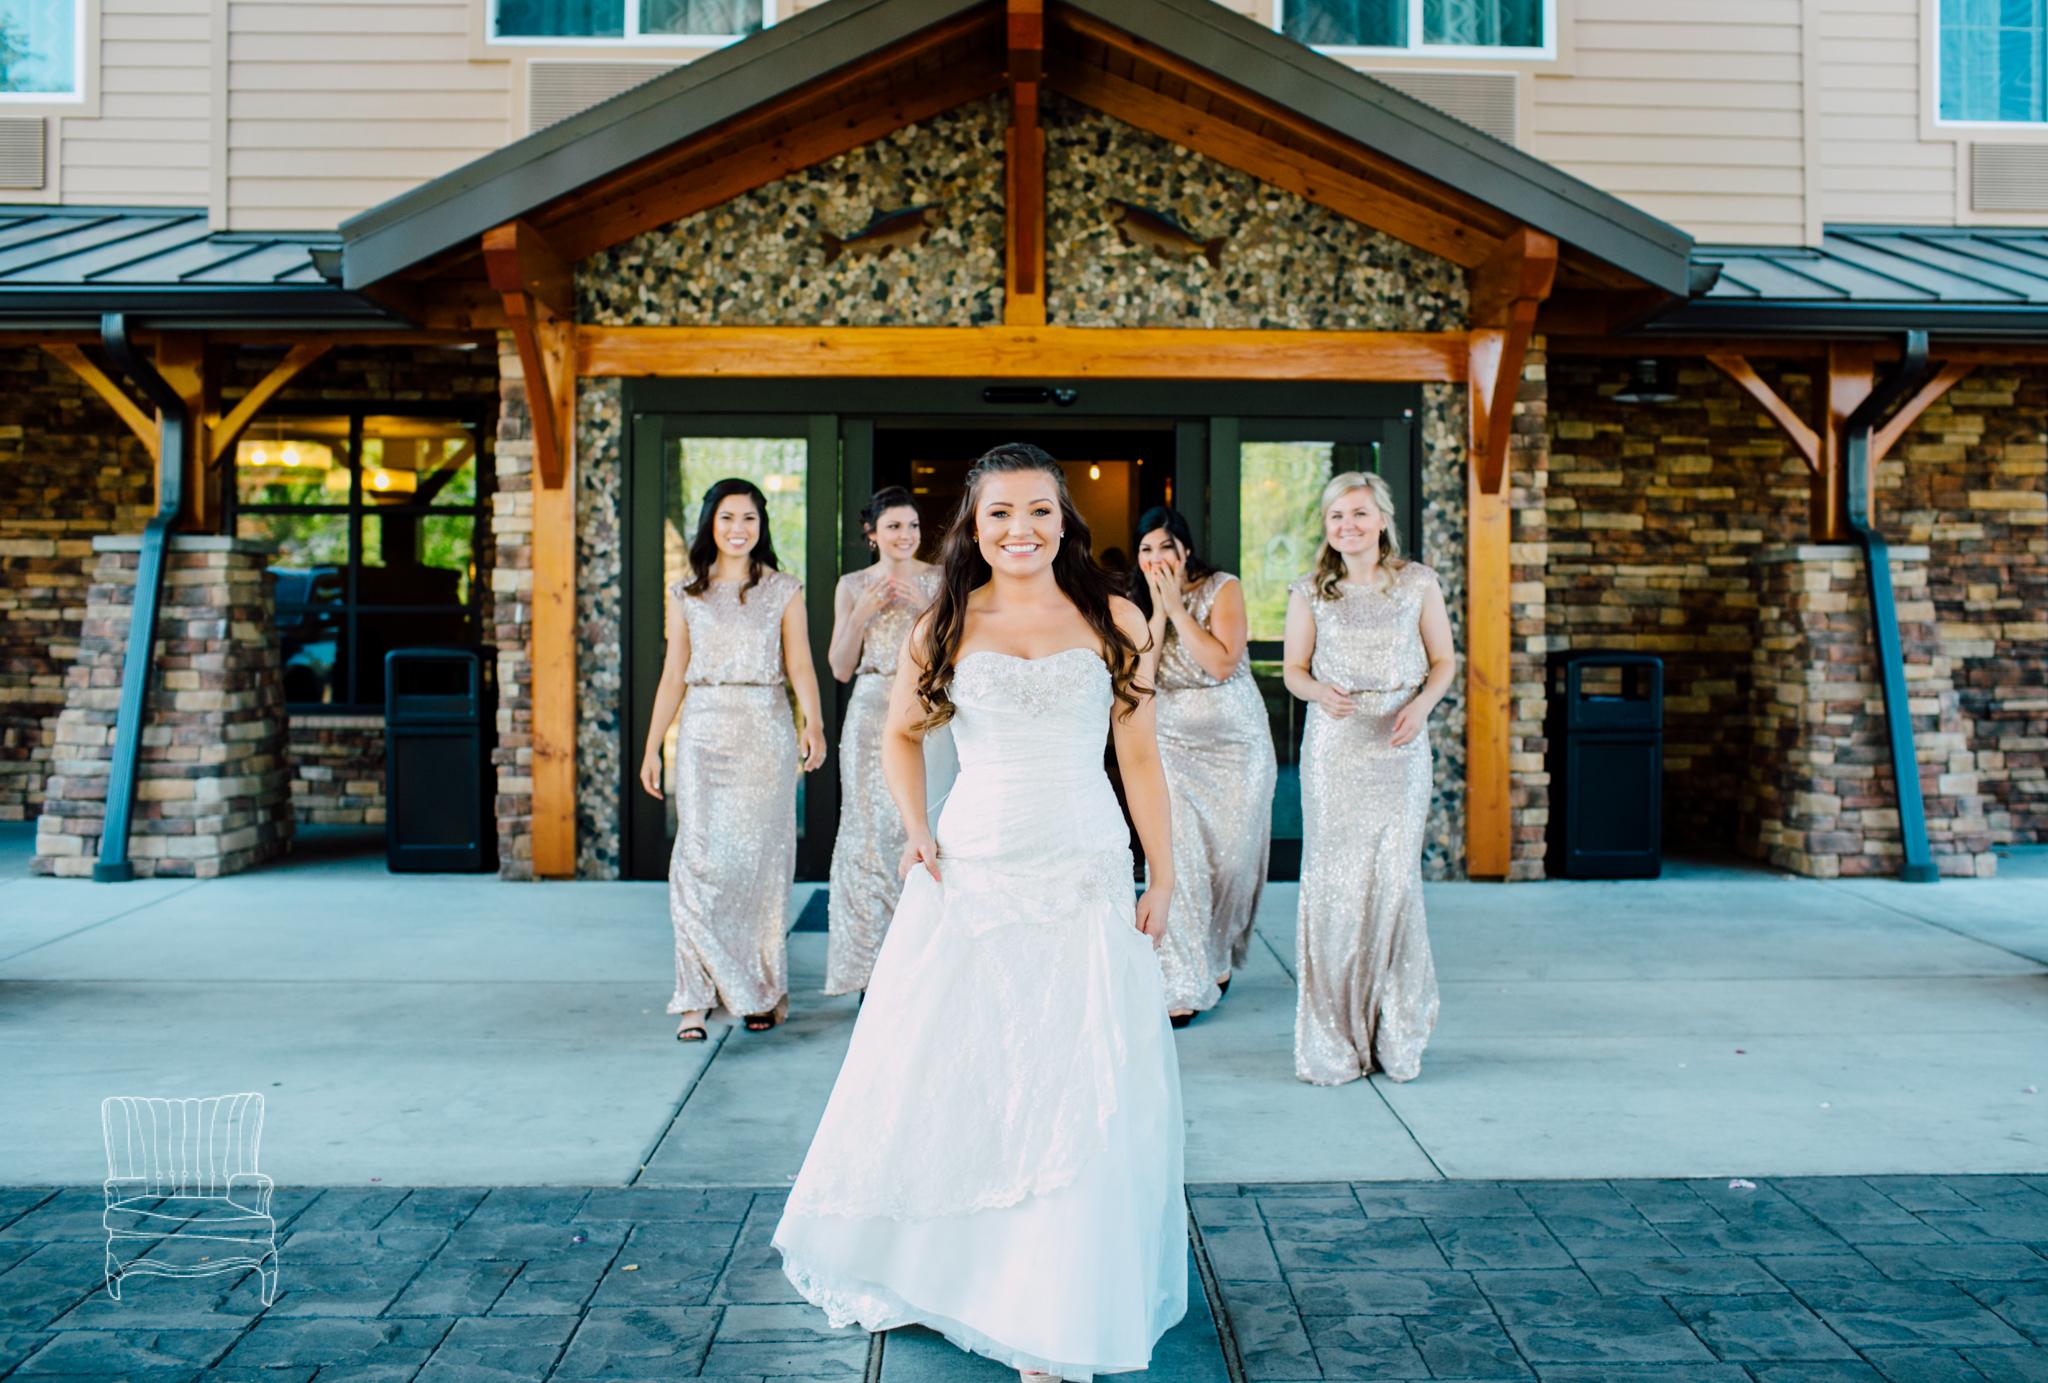 bellingham-washington-wedding-photographer-baker-creek-place-mollee-3.jpg